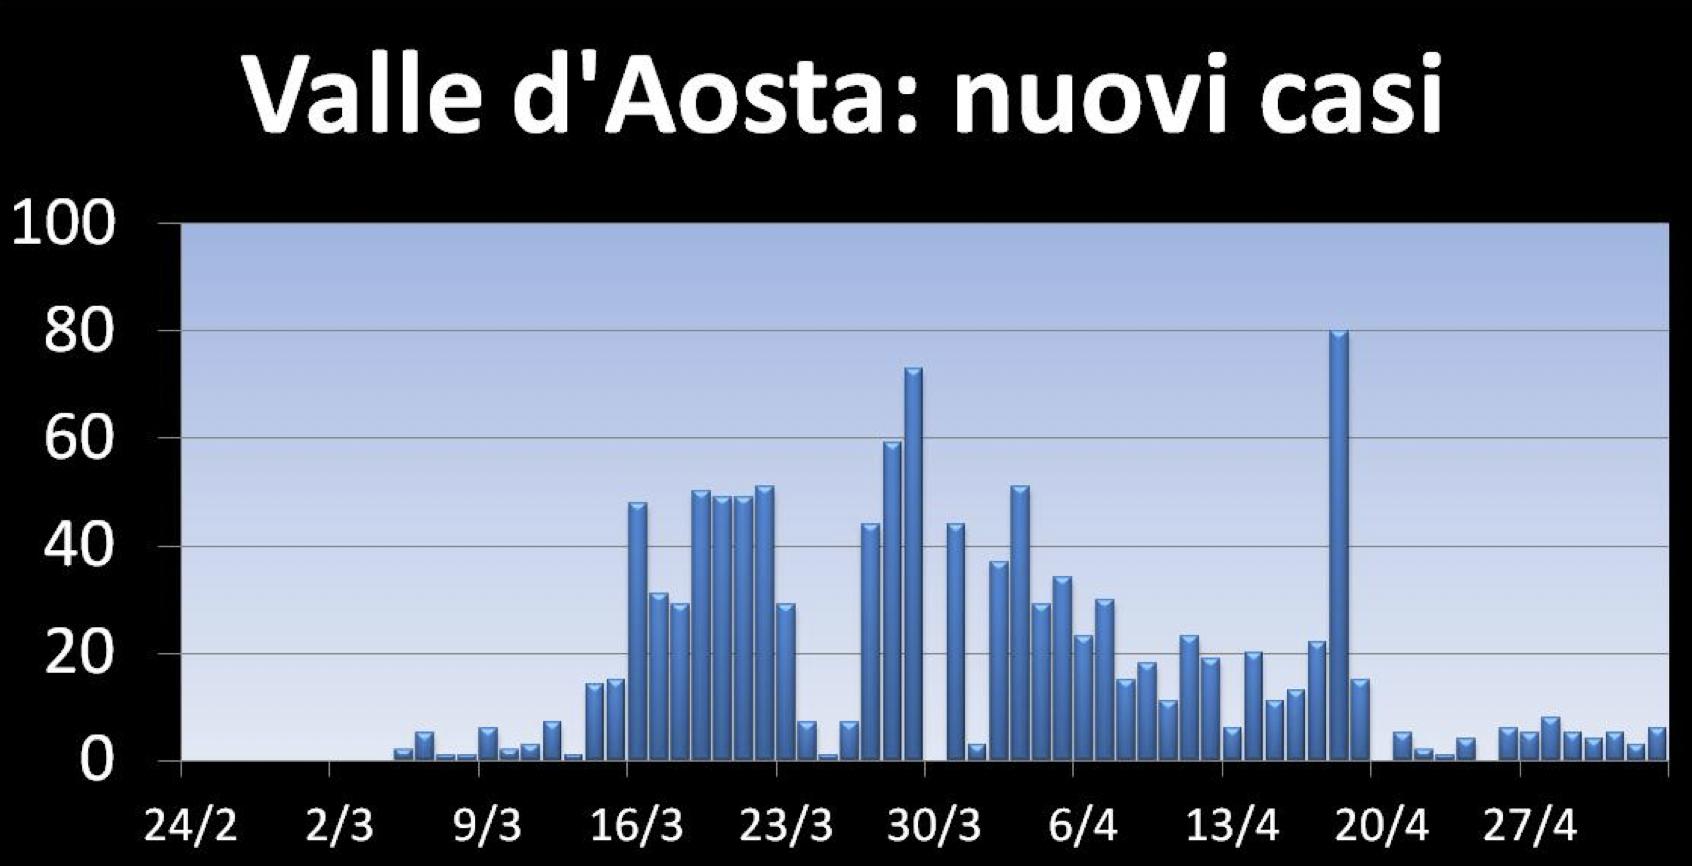 Valle d'Aosta nuovi casi